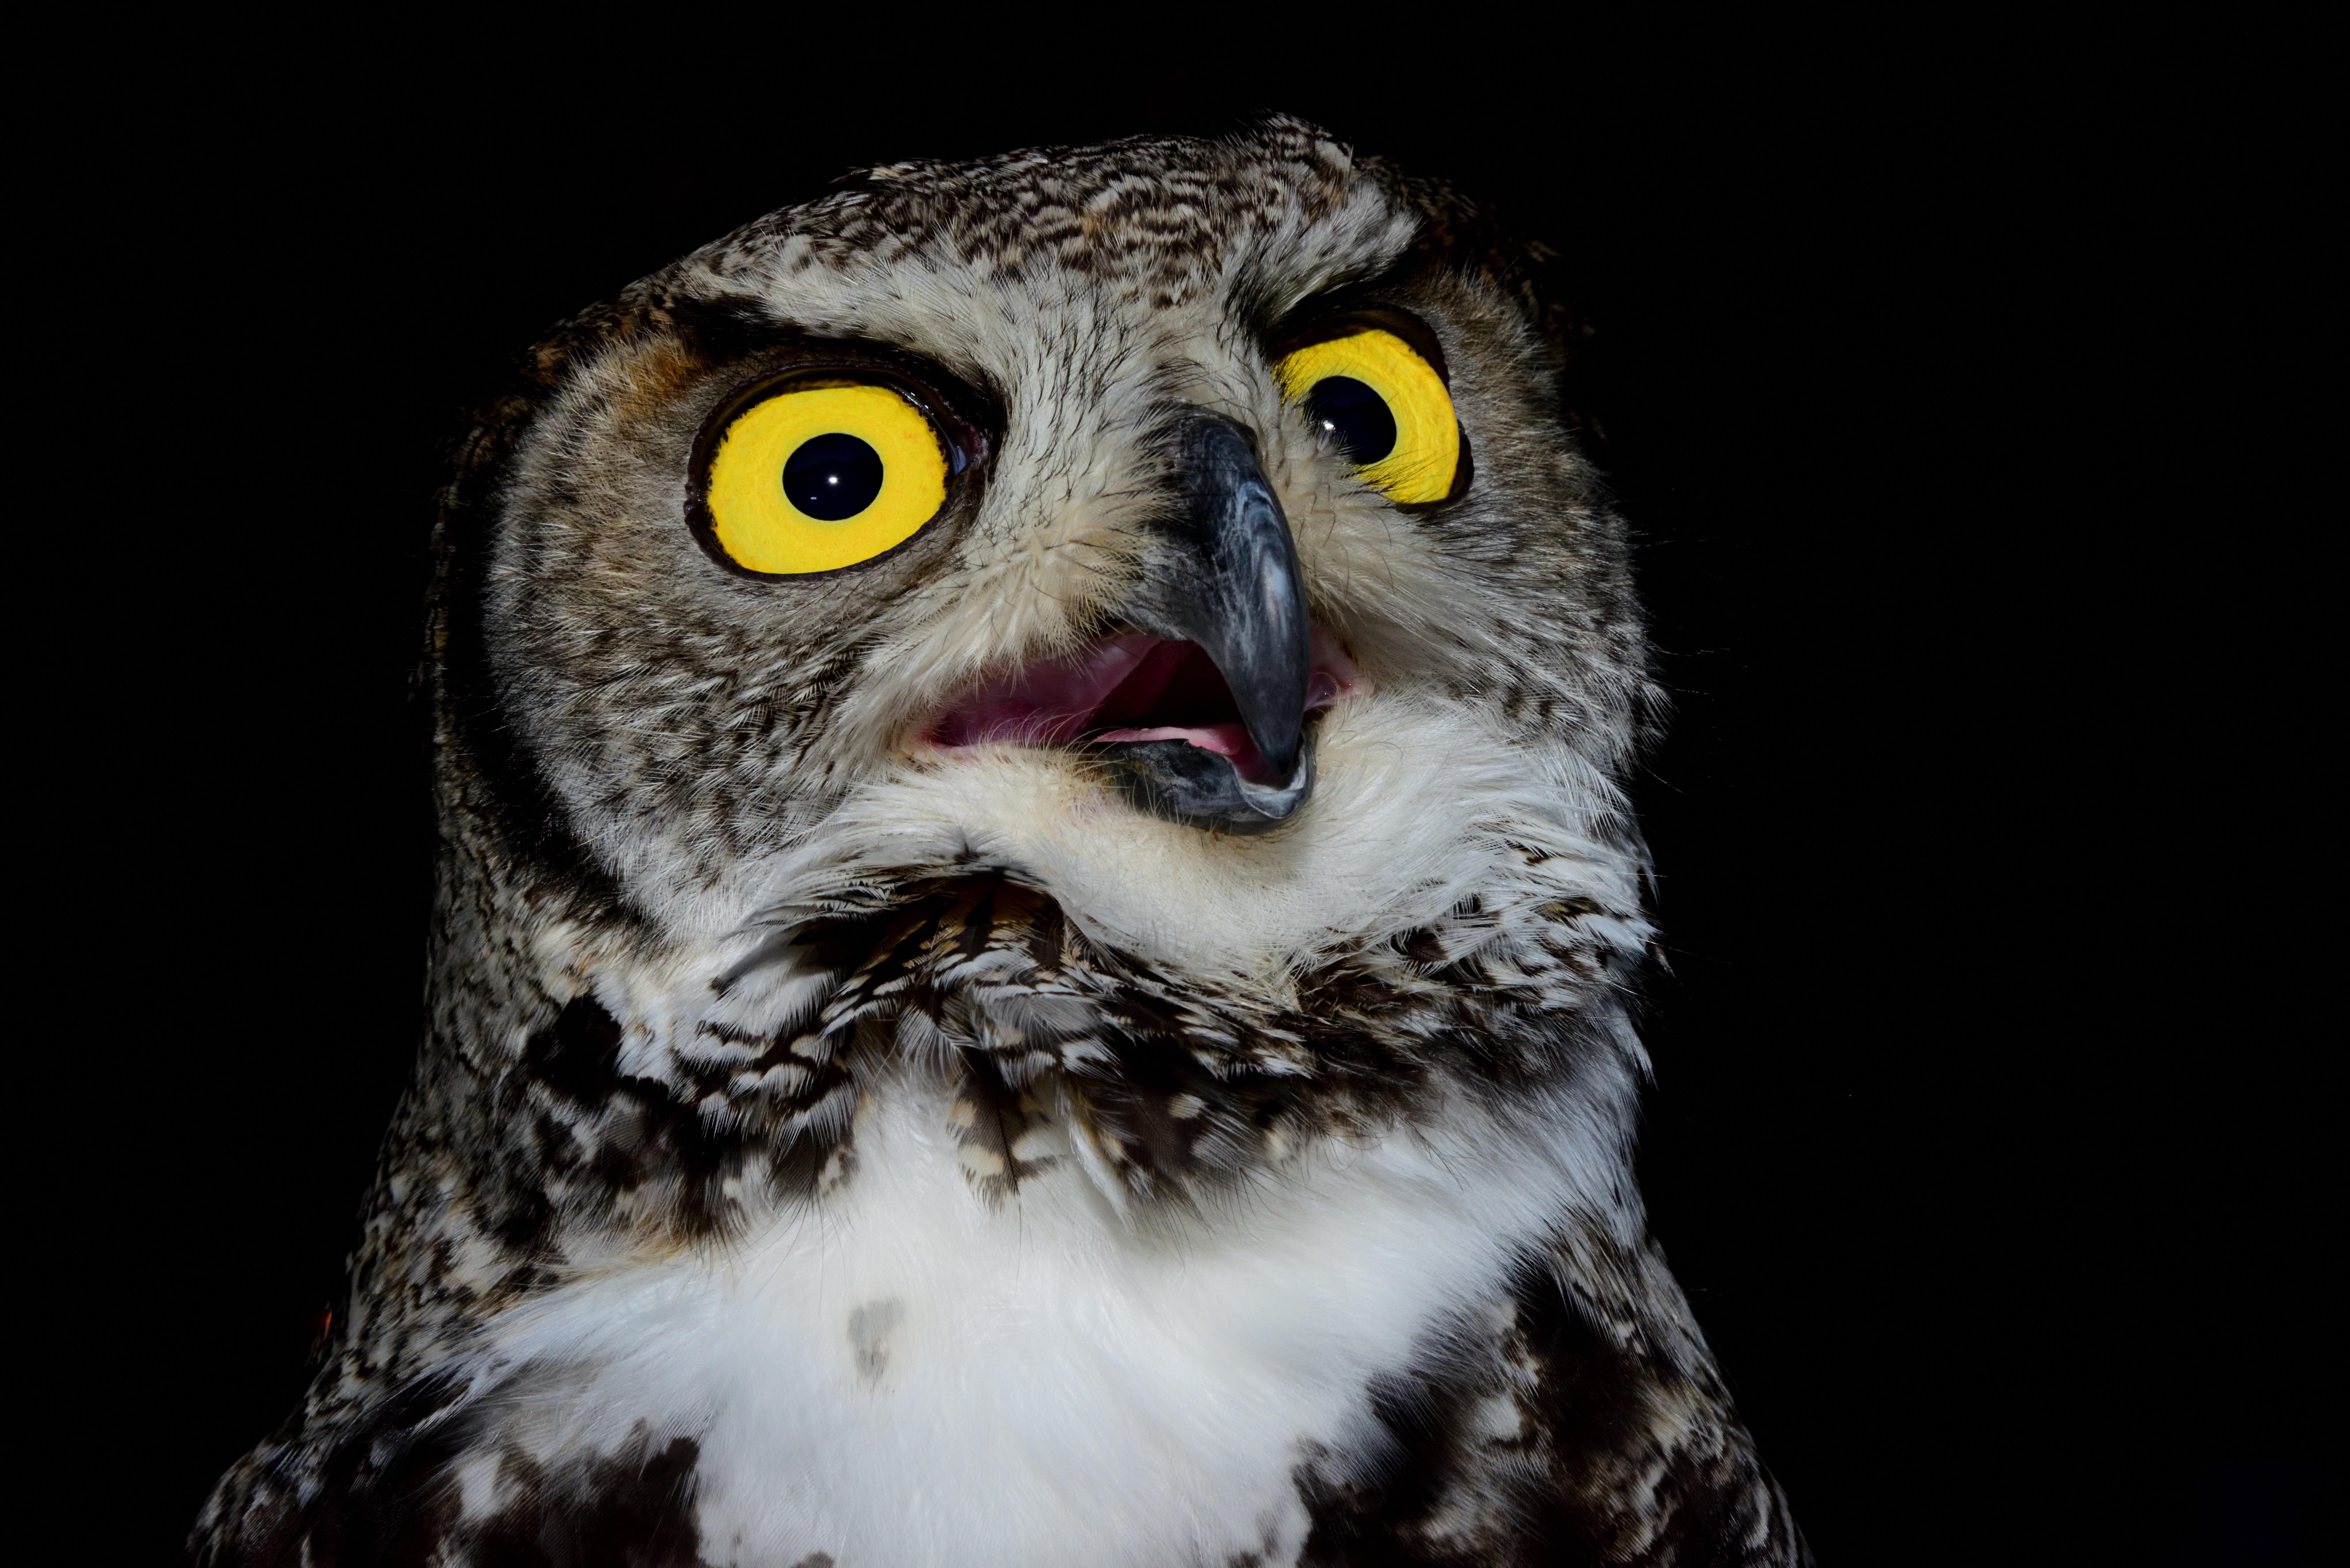 Unduh 92+  Gambar Burung Hantu Mata Kuning  Terbaik Gratis